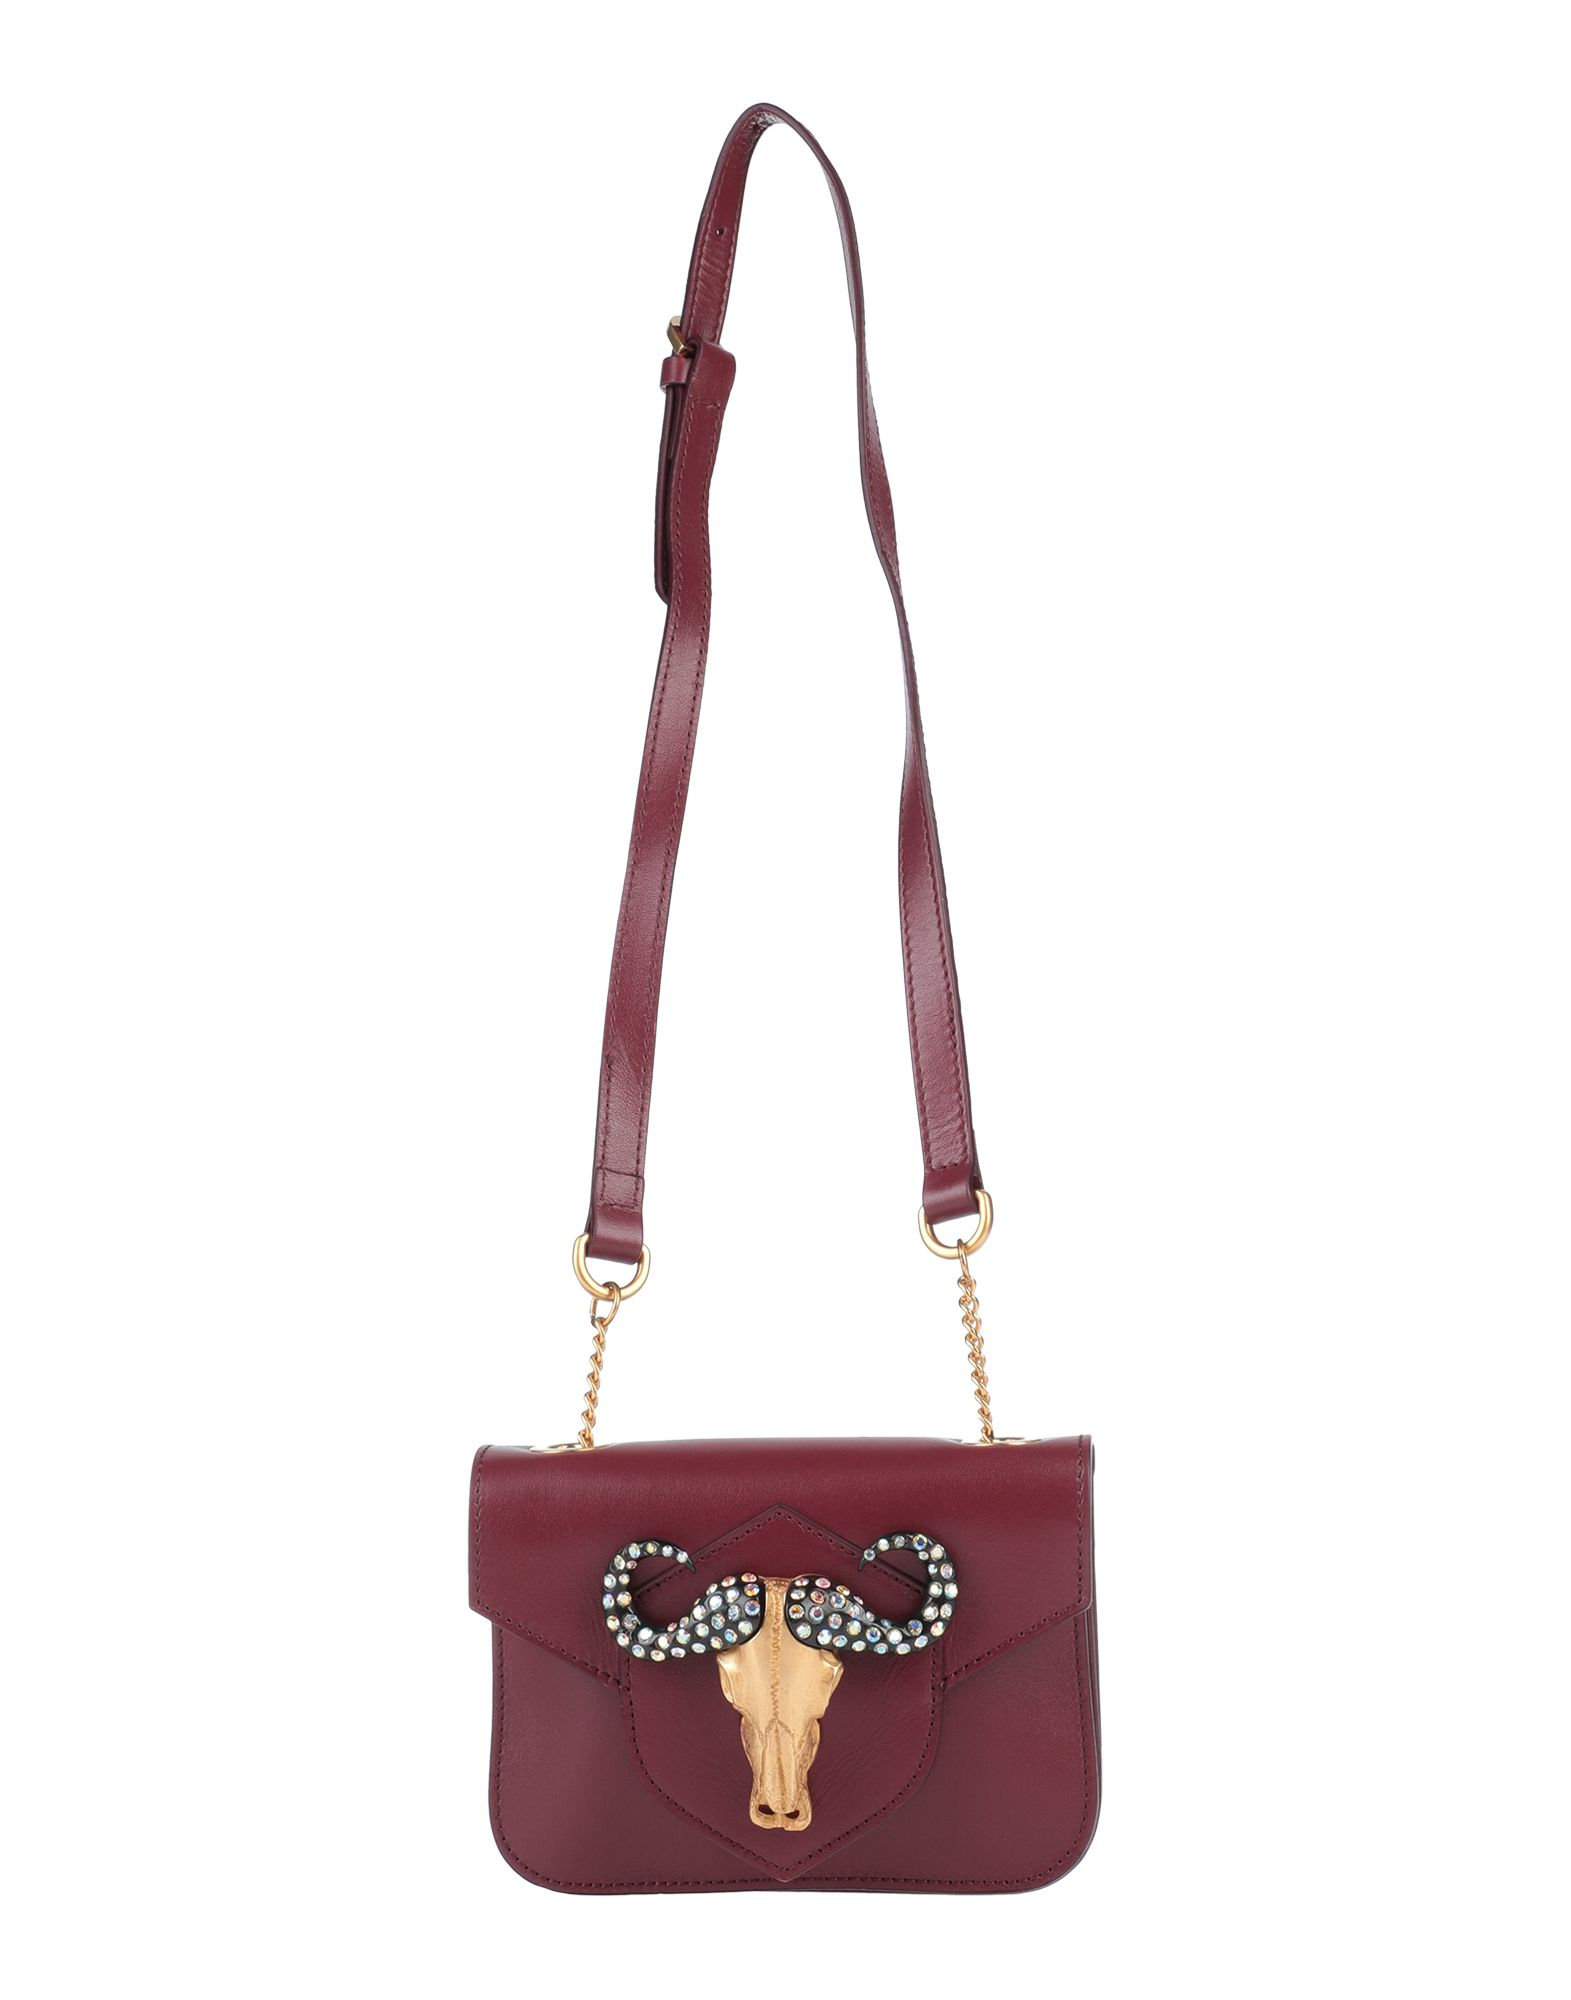 JUST CAVALLI Shoulder bags - Item 45517611